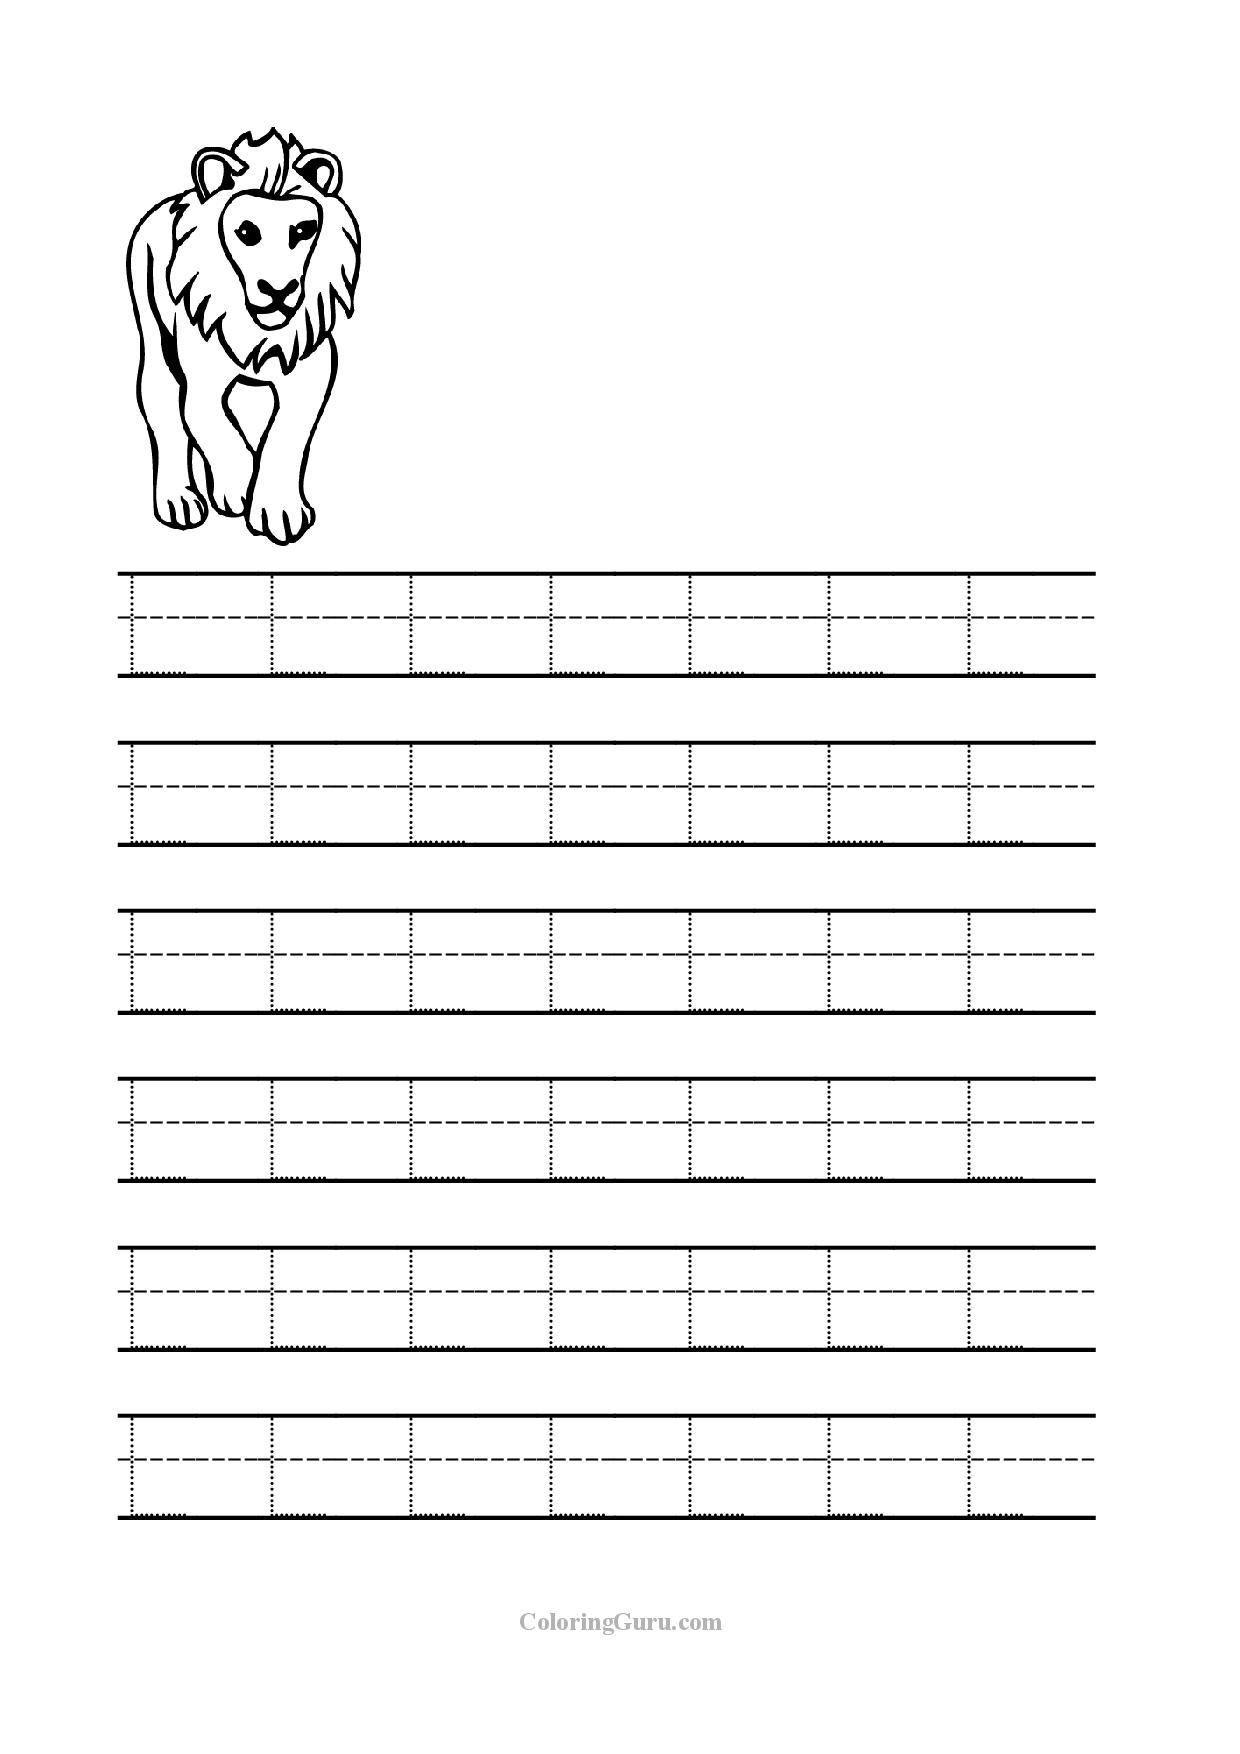 3 Letter L Writing Practice Worksheet Free Printable